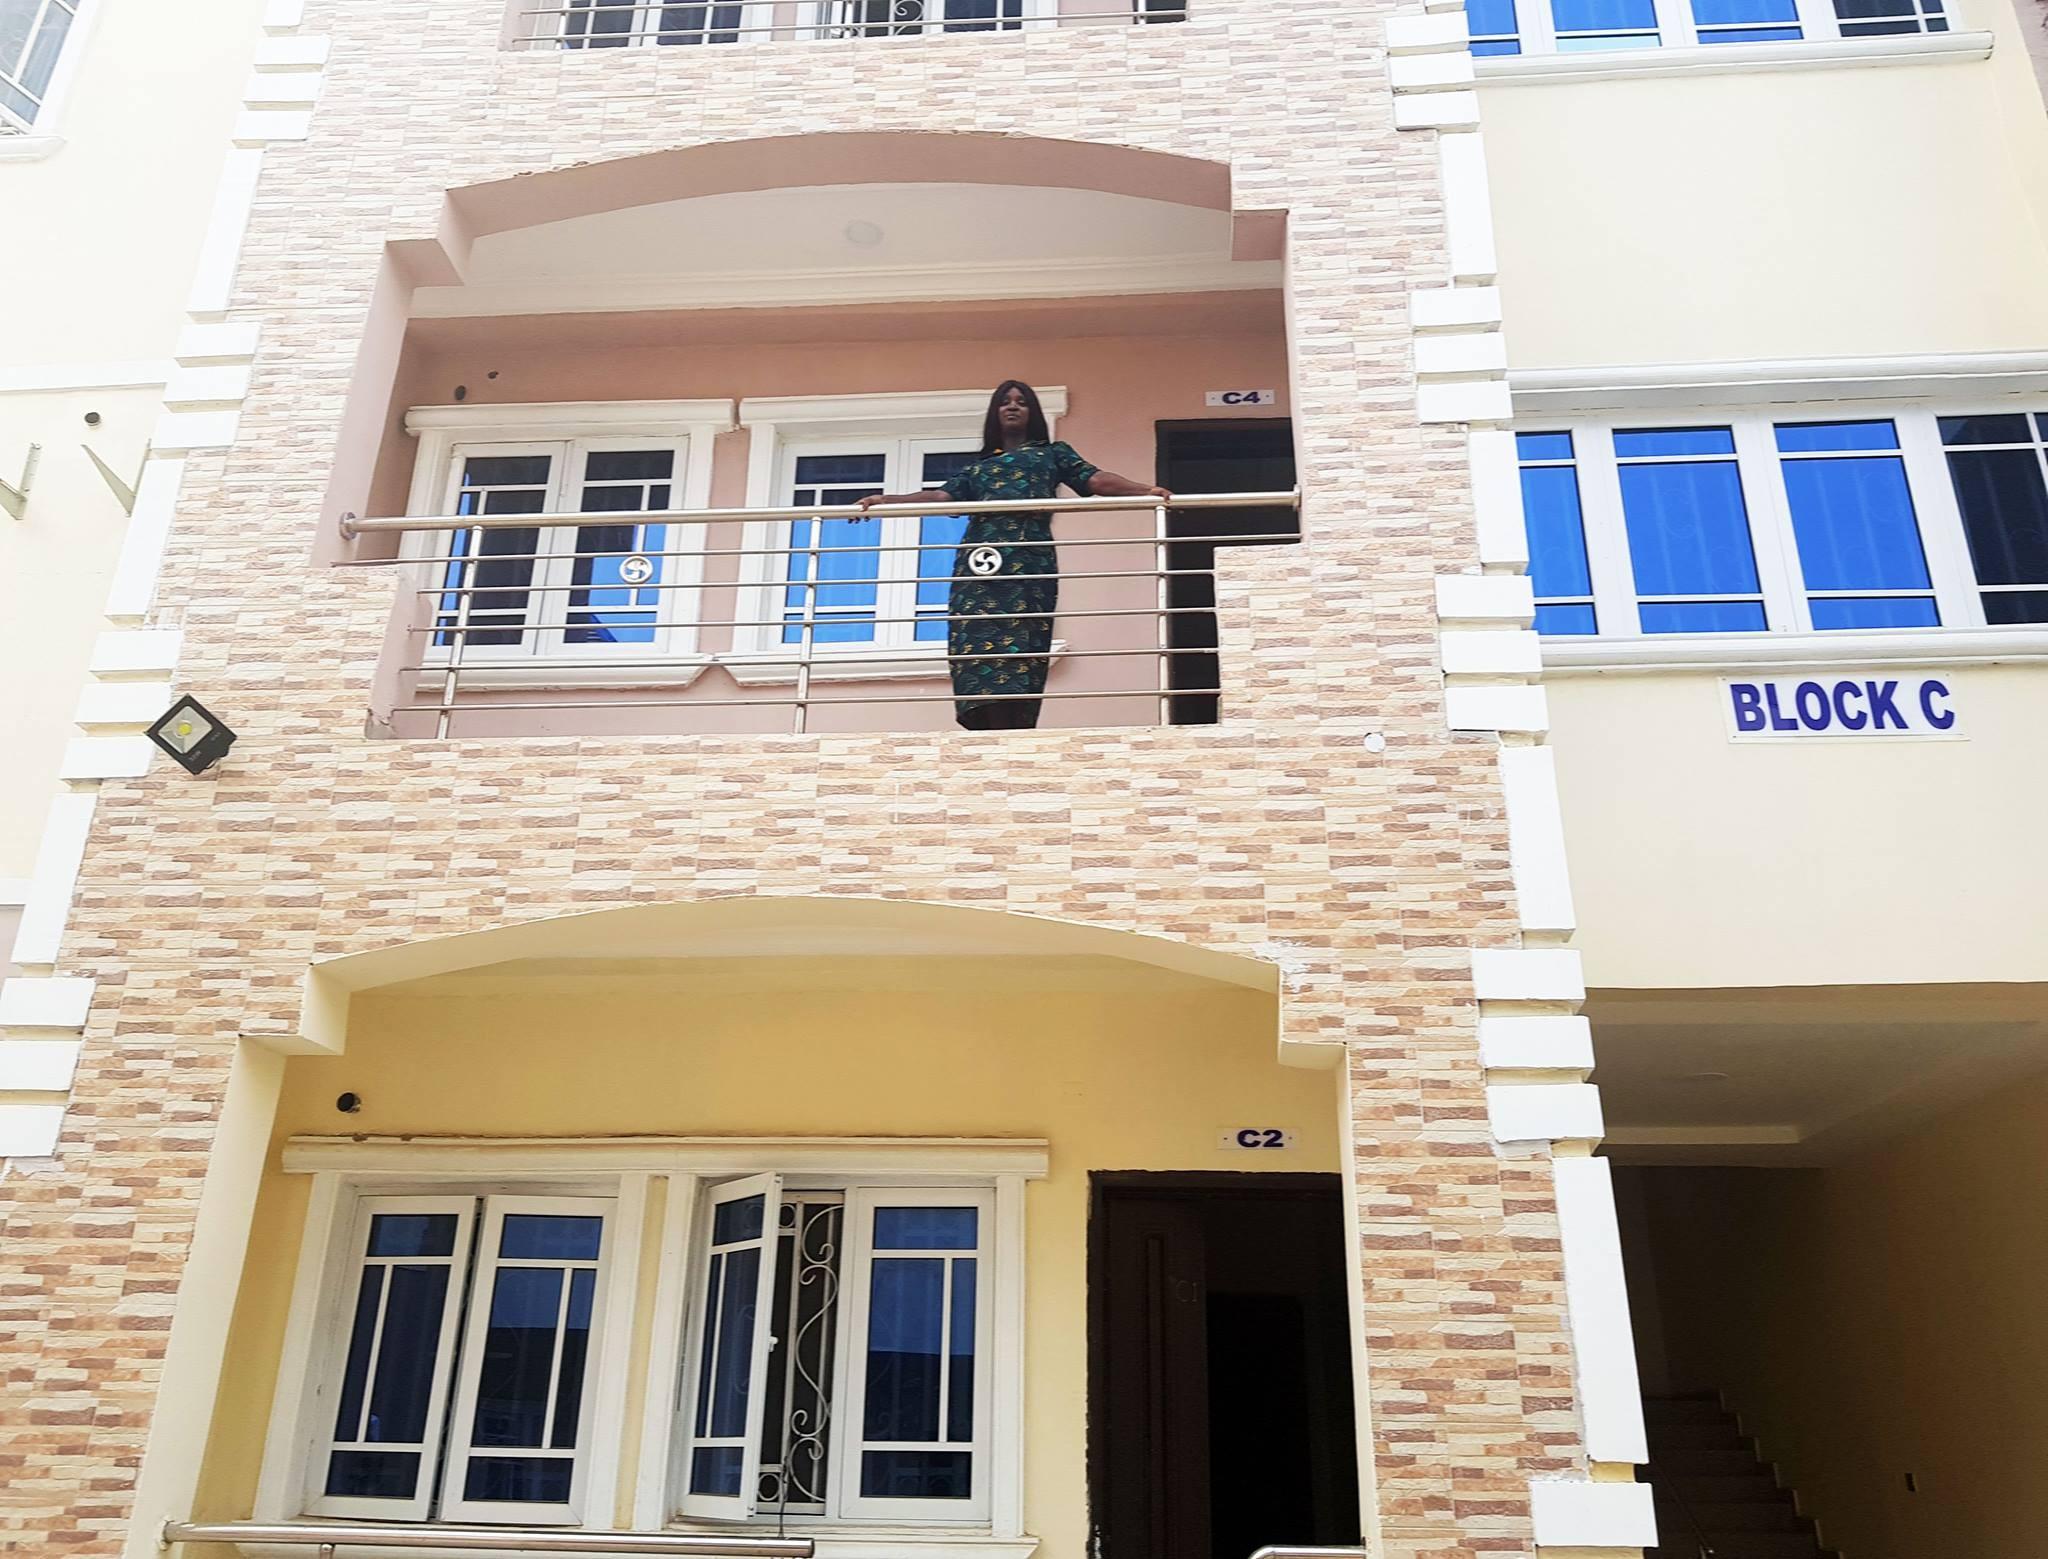 Ebonyi lawmaker, Maria Ude Nwachi shows off her new Maitama, Abuja house